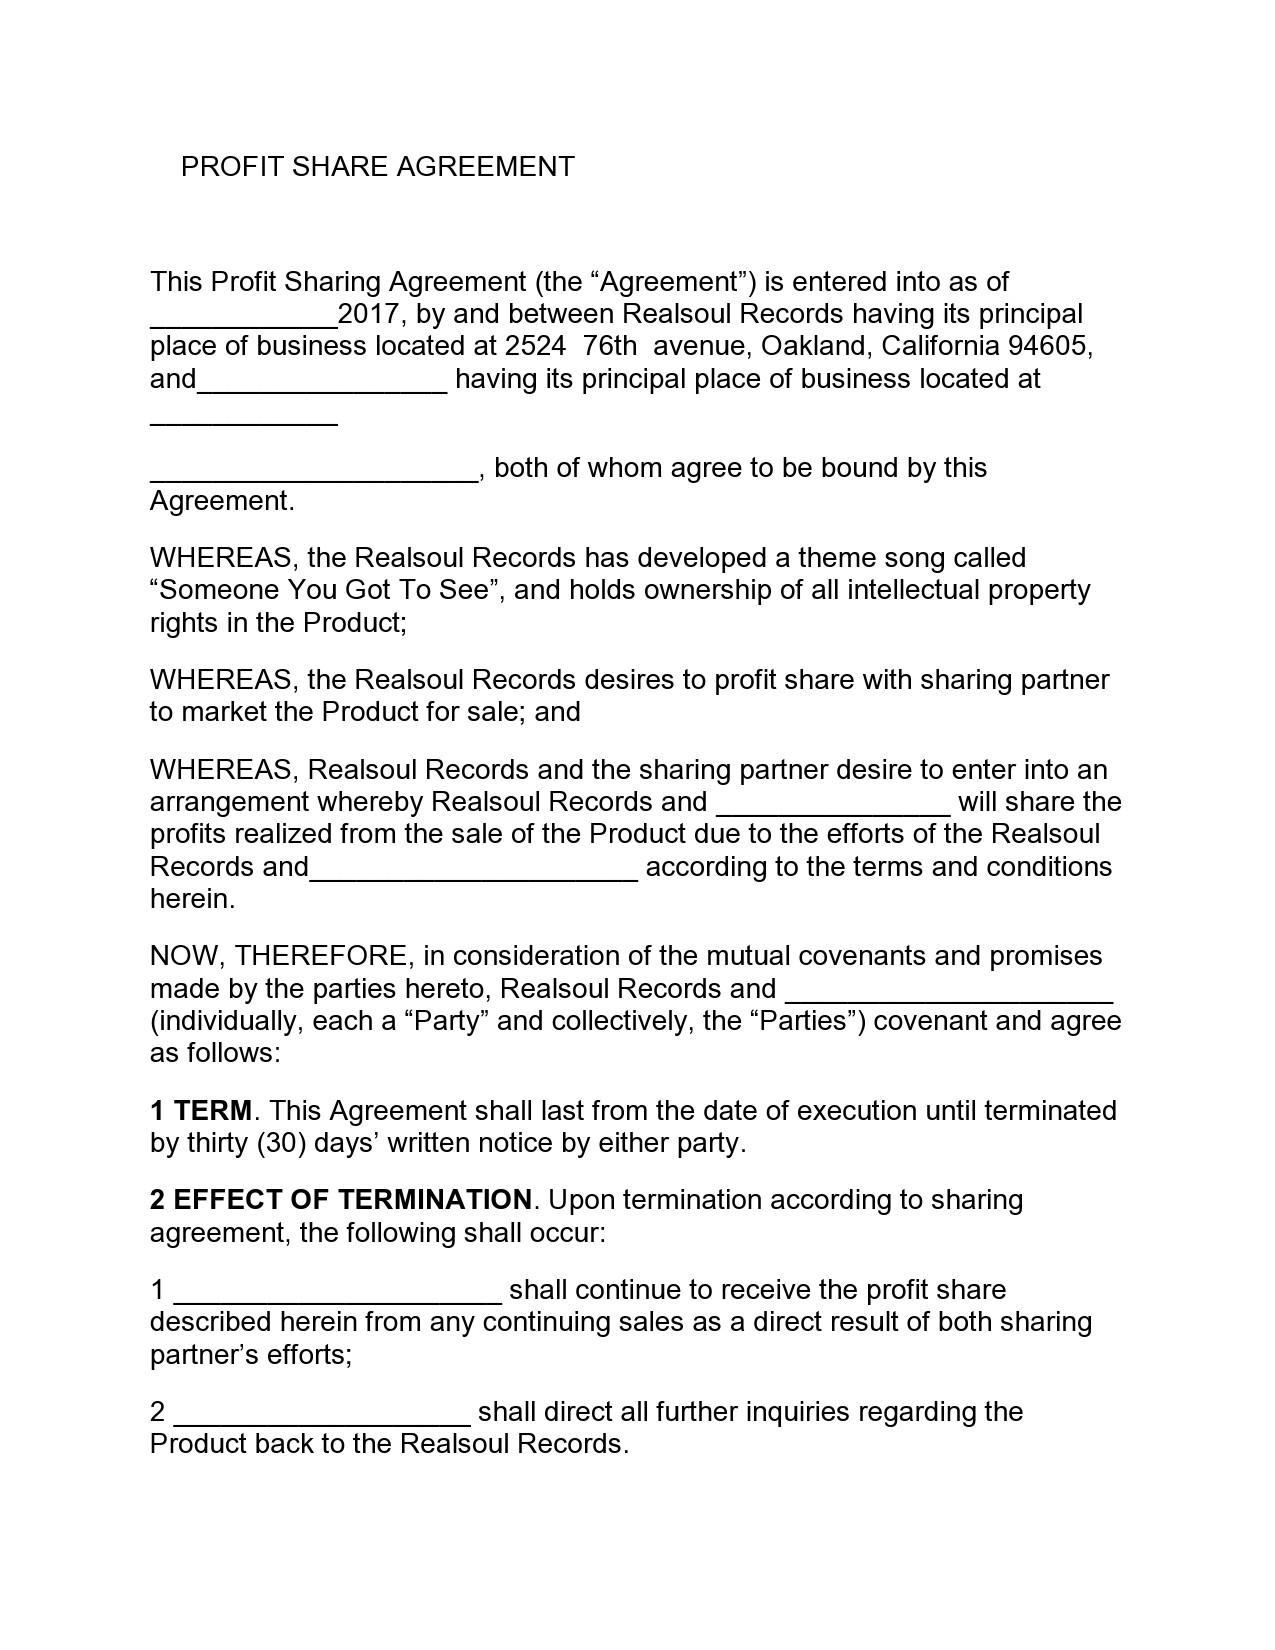 Free profit sharing agreement 13